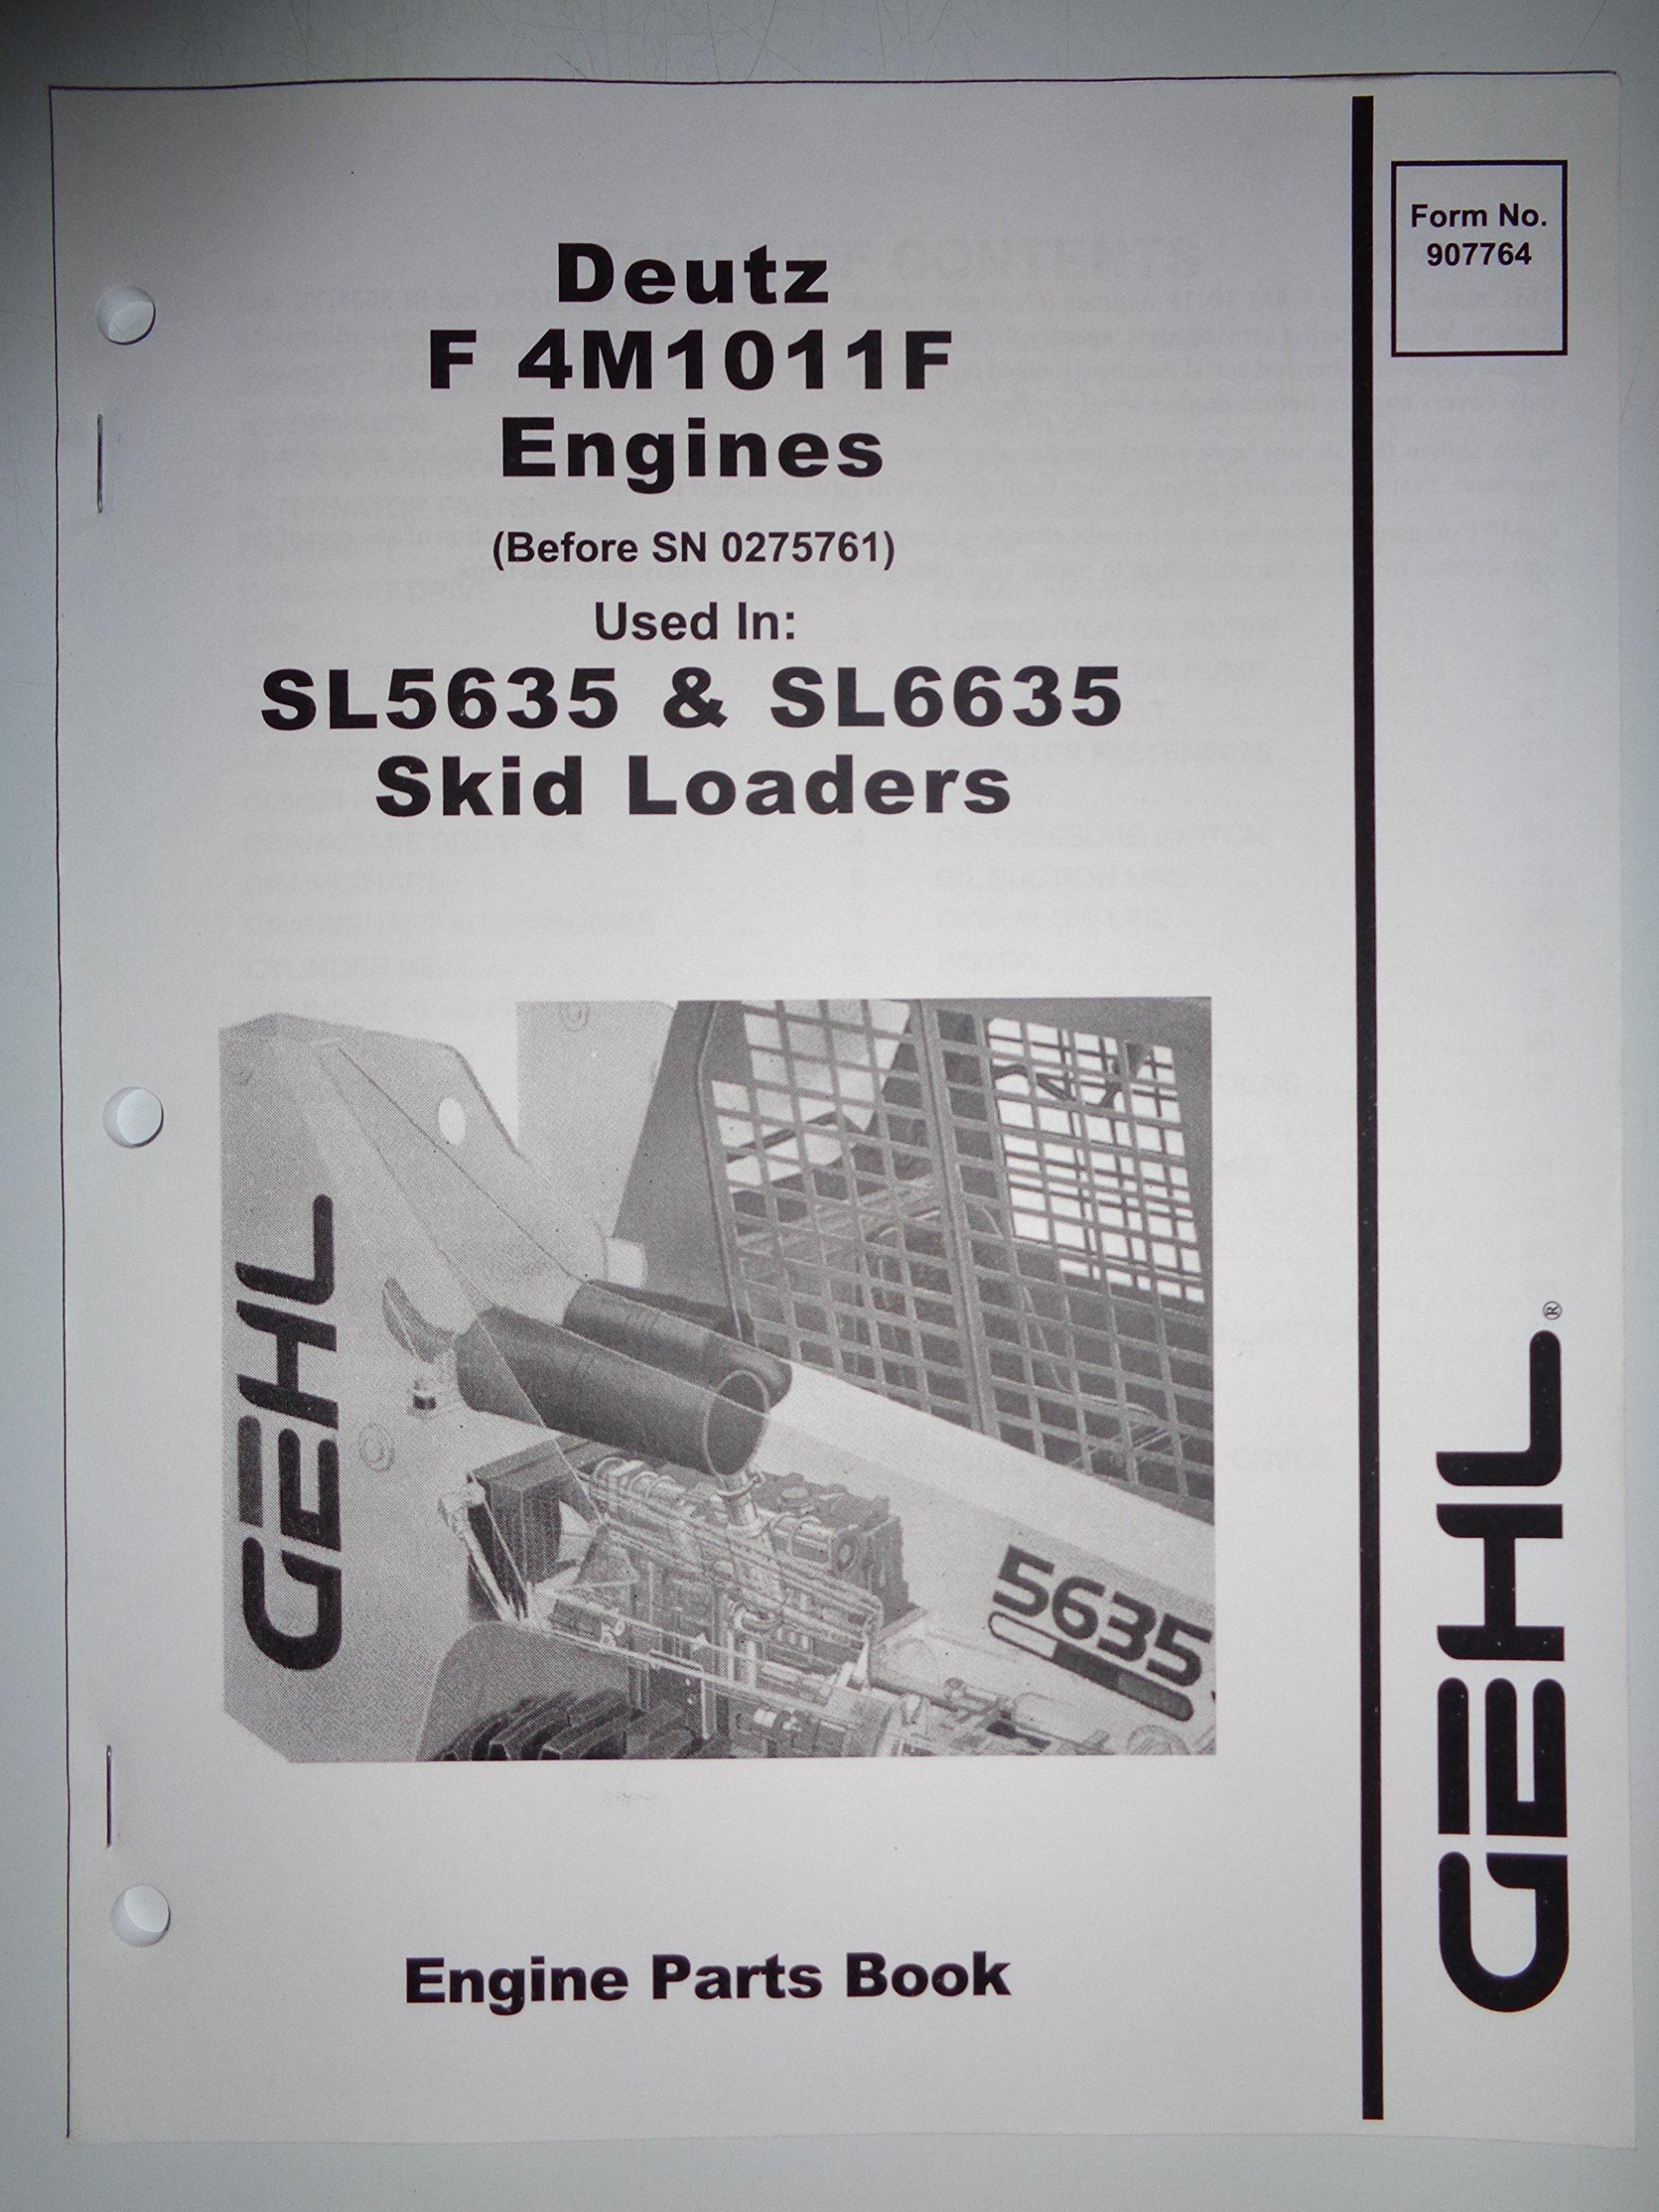 Gehl Deutz F 4M1011F Engines Used In SL5635 And SL6635 Skid